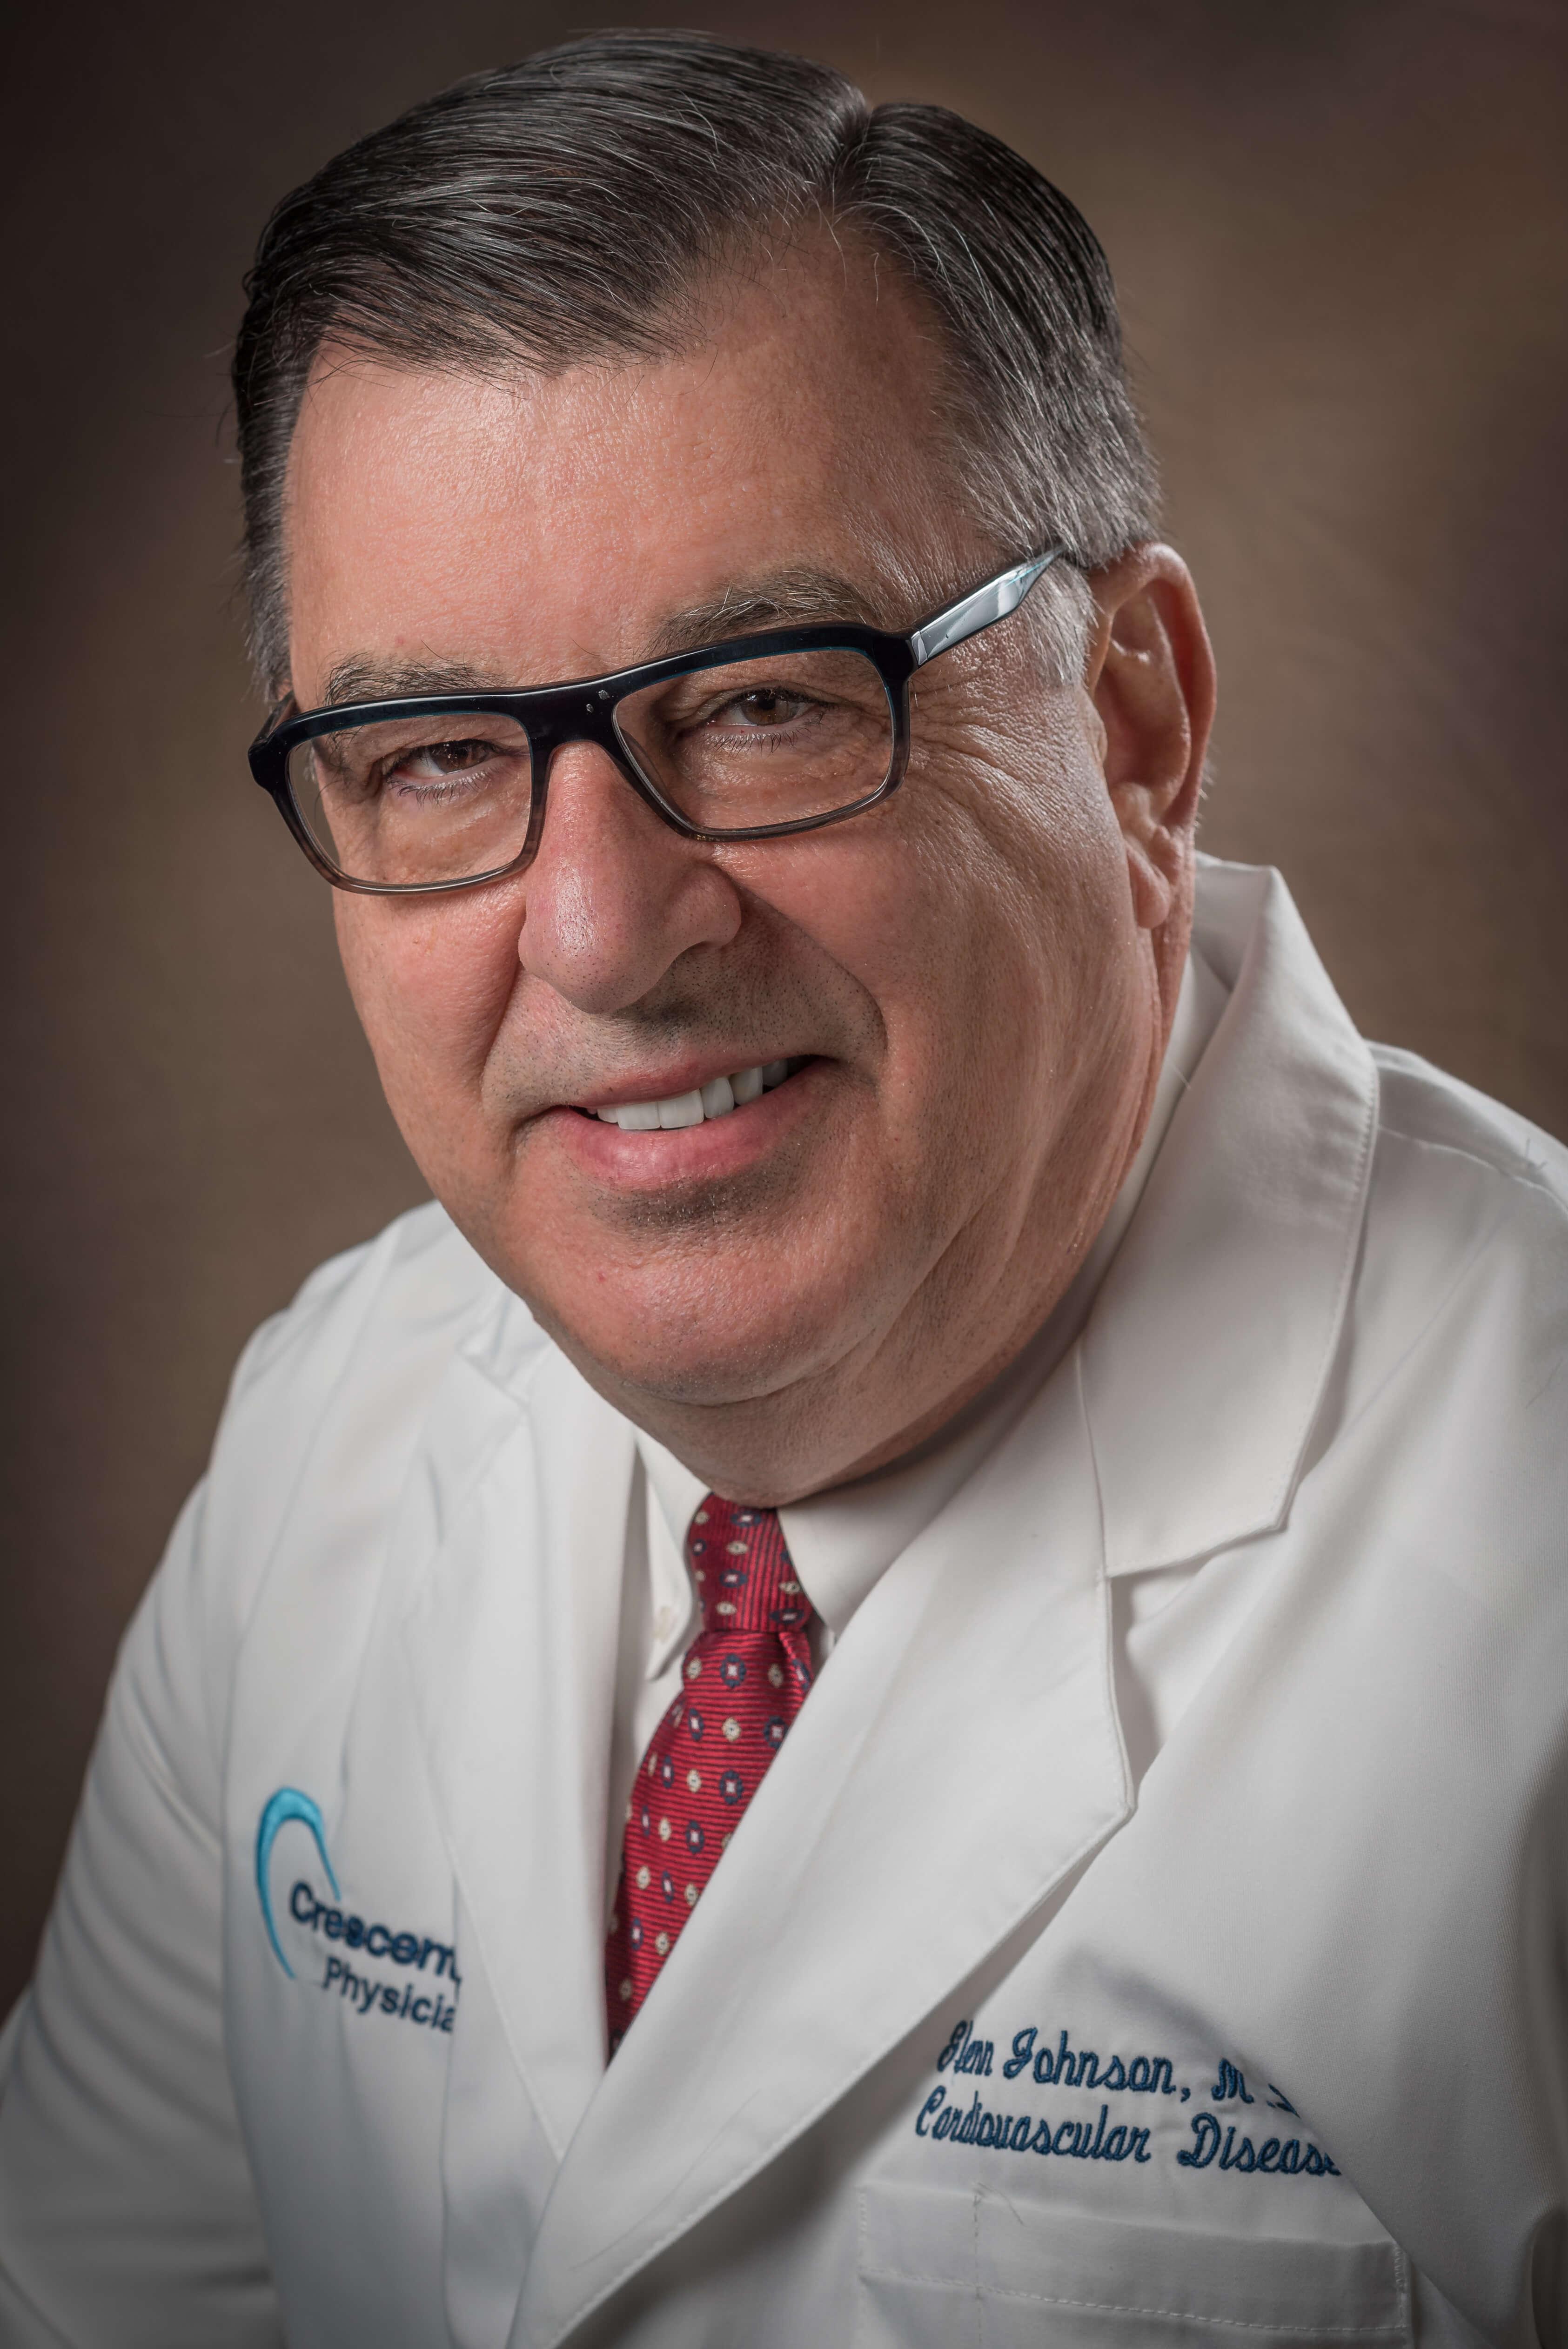 Glenn M Johnson, MD